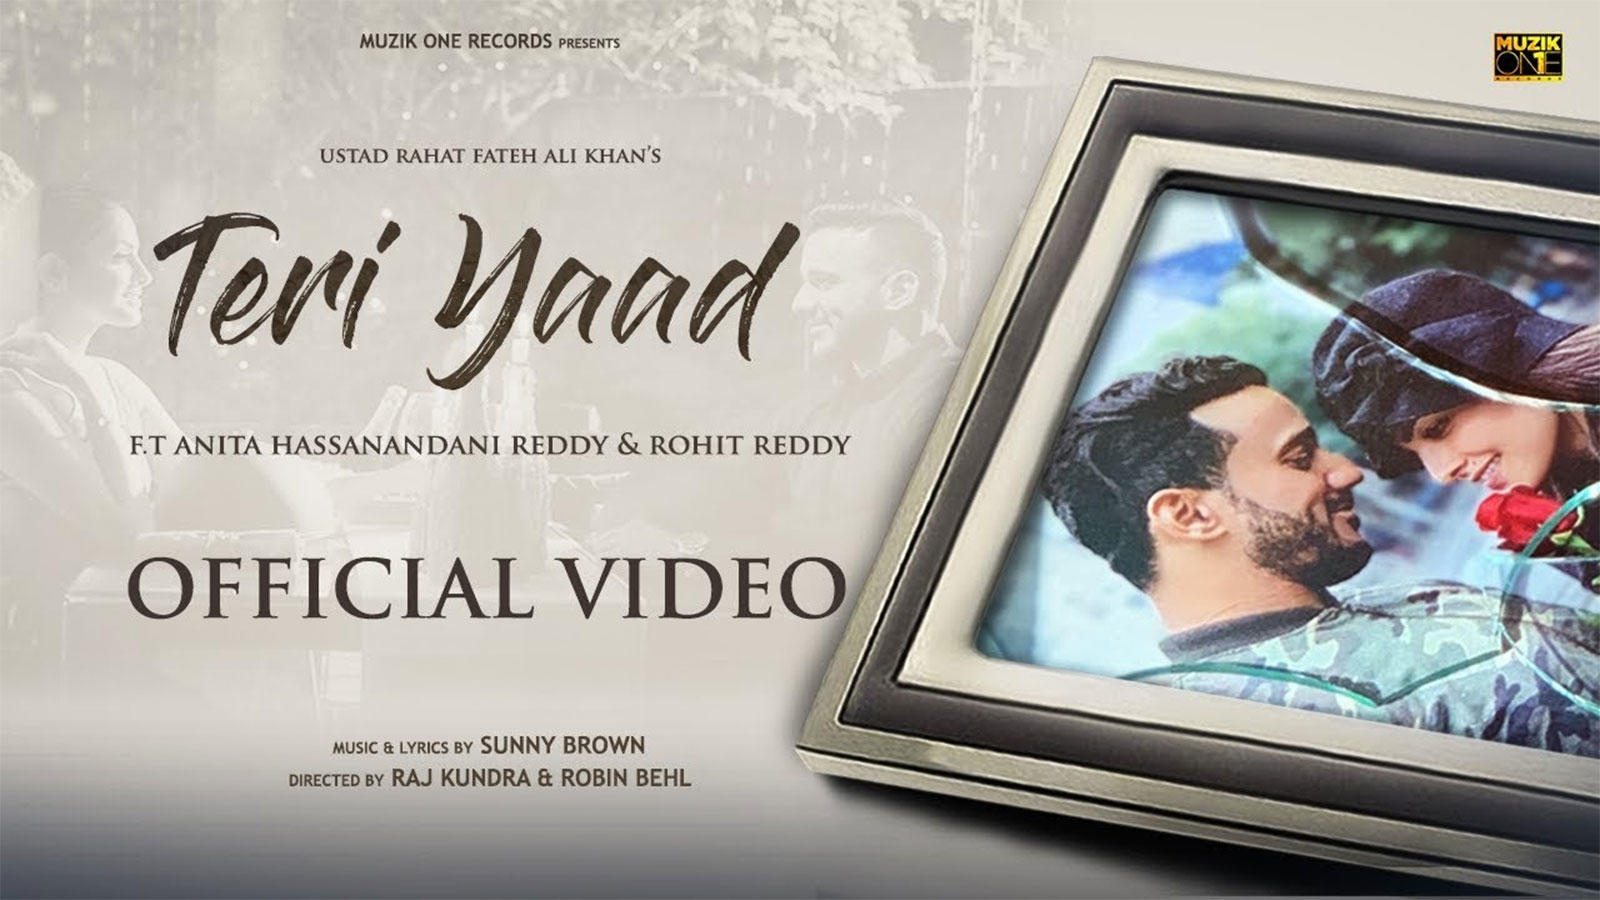 Latest Punjabi Song Teri Yaad Sung By Ustad Rahat Fateh Ali Khan